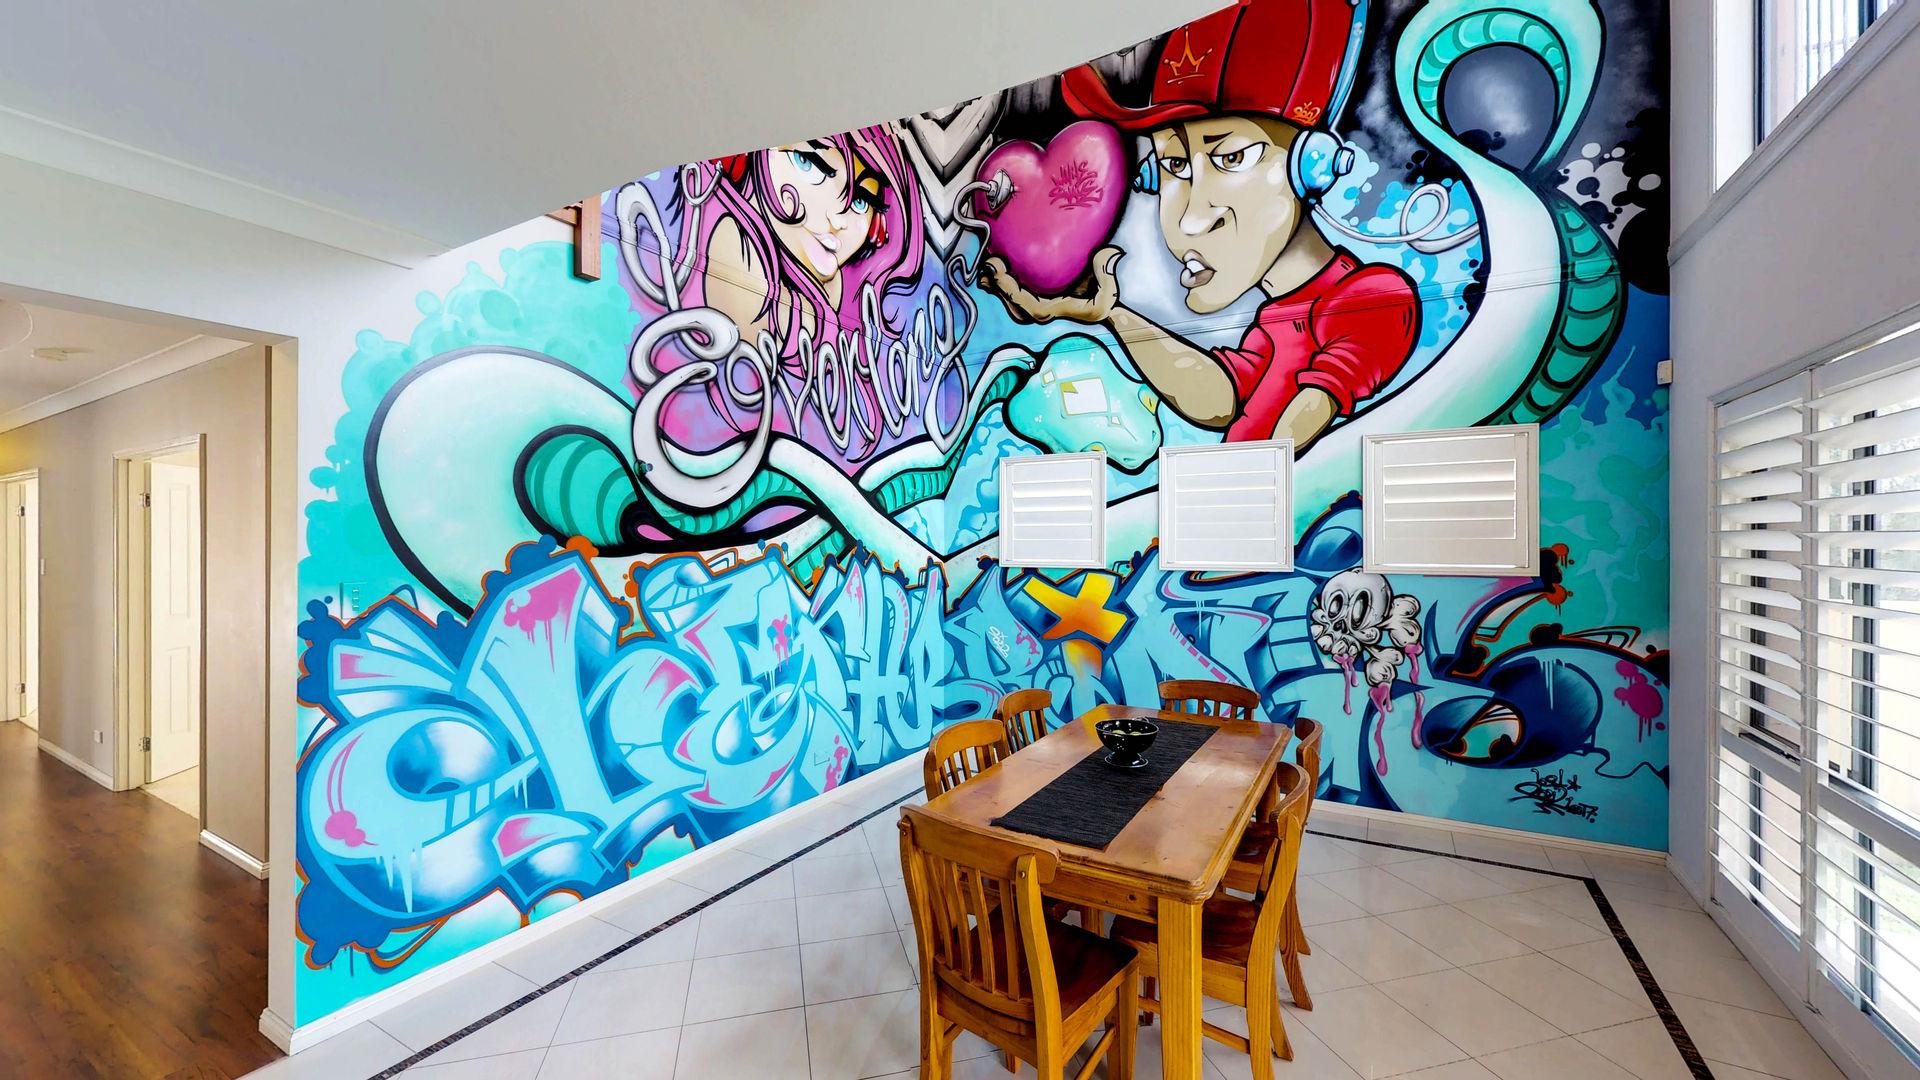 wix gallery-4.jpg